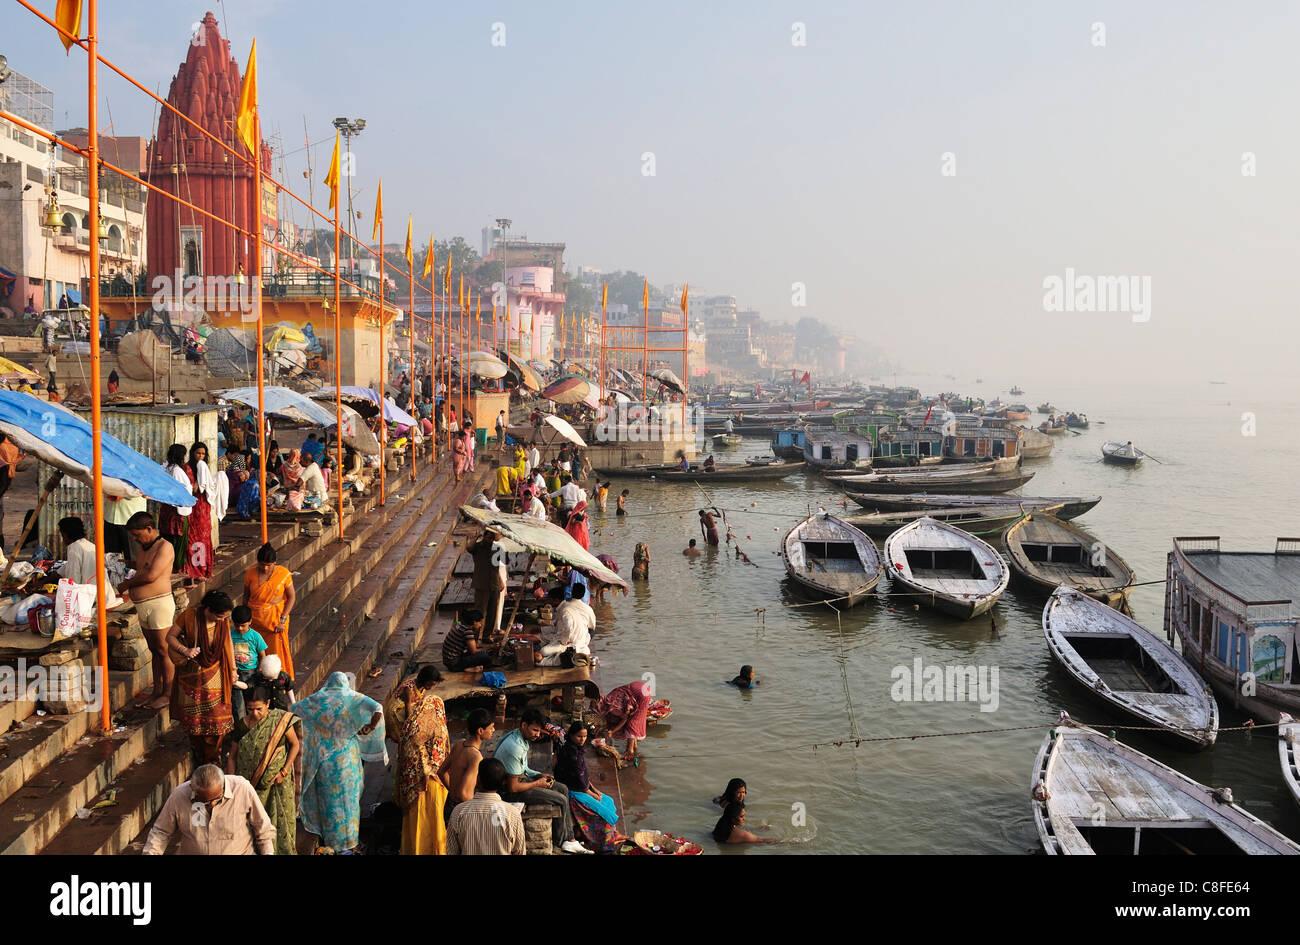 Ghats en el río Ganges, Varanasi (Benares, Uttar Pradesh, India Imagen De Stock